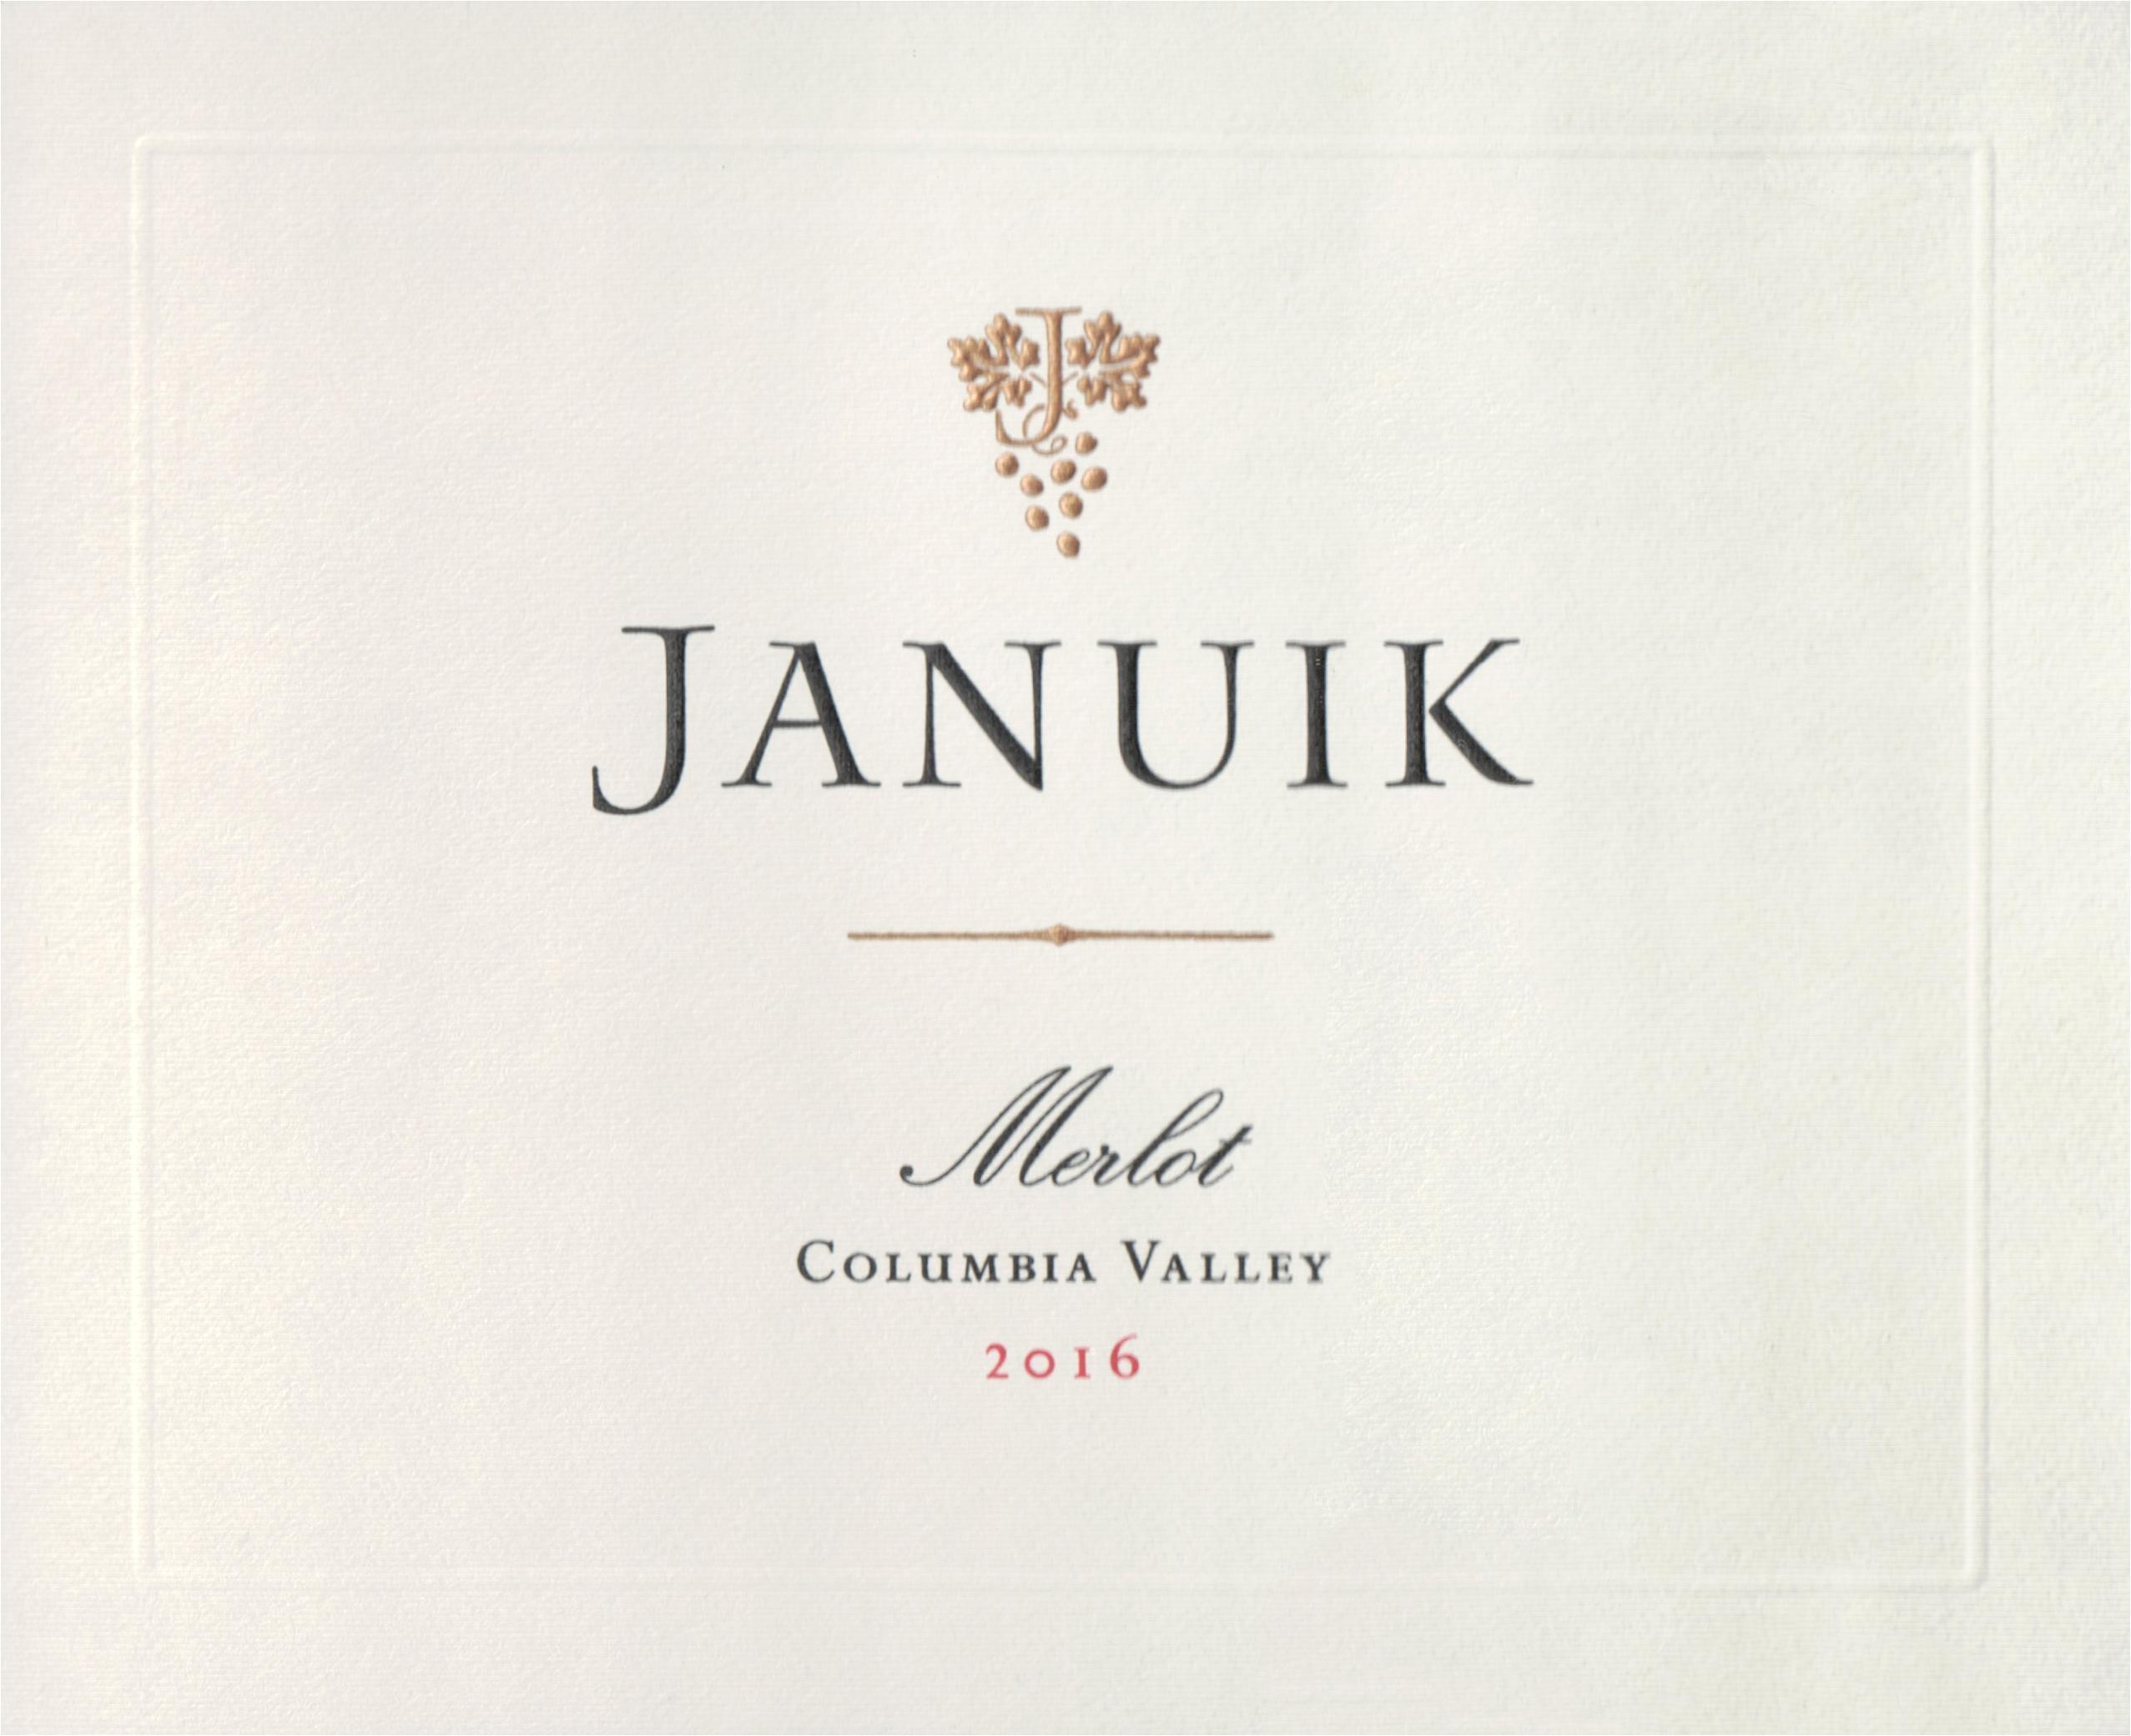 Januik Winery Merlot Columbia Valley 2016